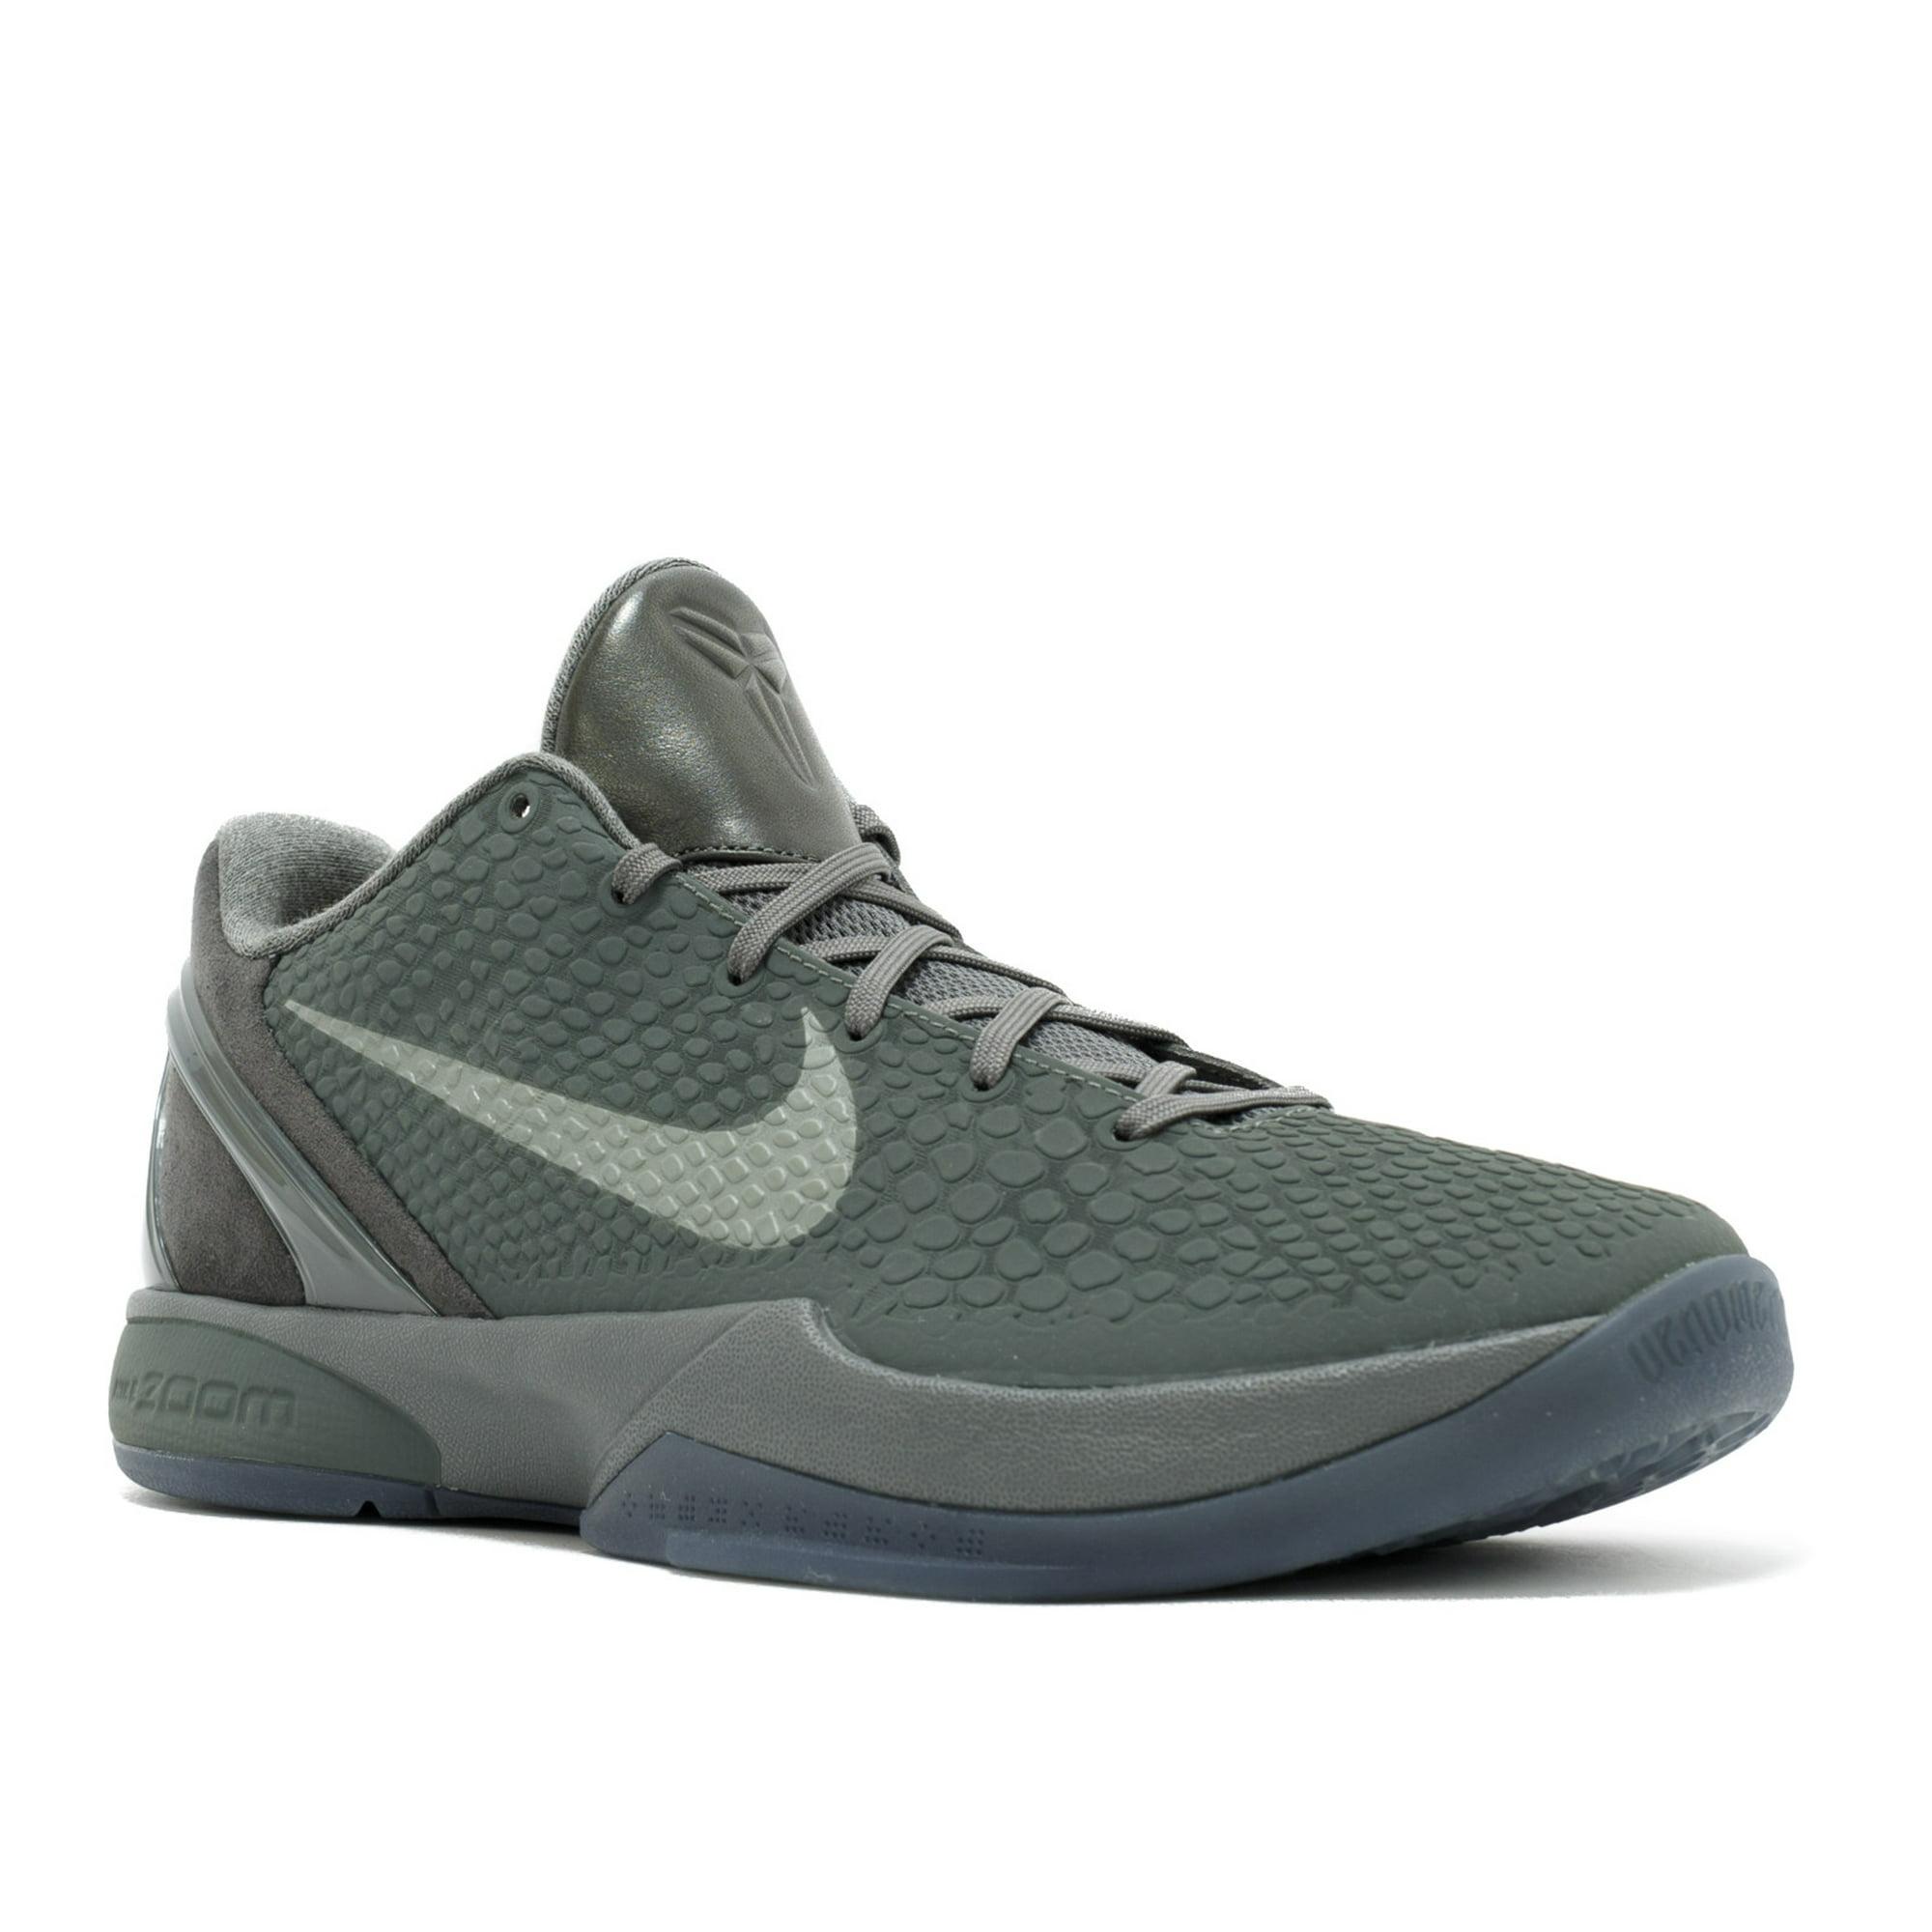 big sale 808c7 7e667 Nike - Men - Zoom Kobe 6 Ftb  Fade To Black  - 869457-007 - Size 12    Walmart Canada